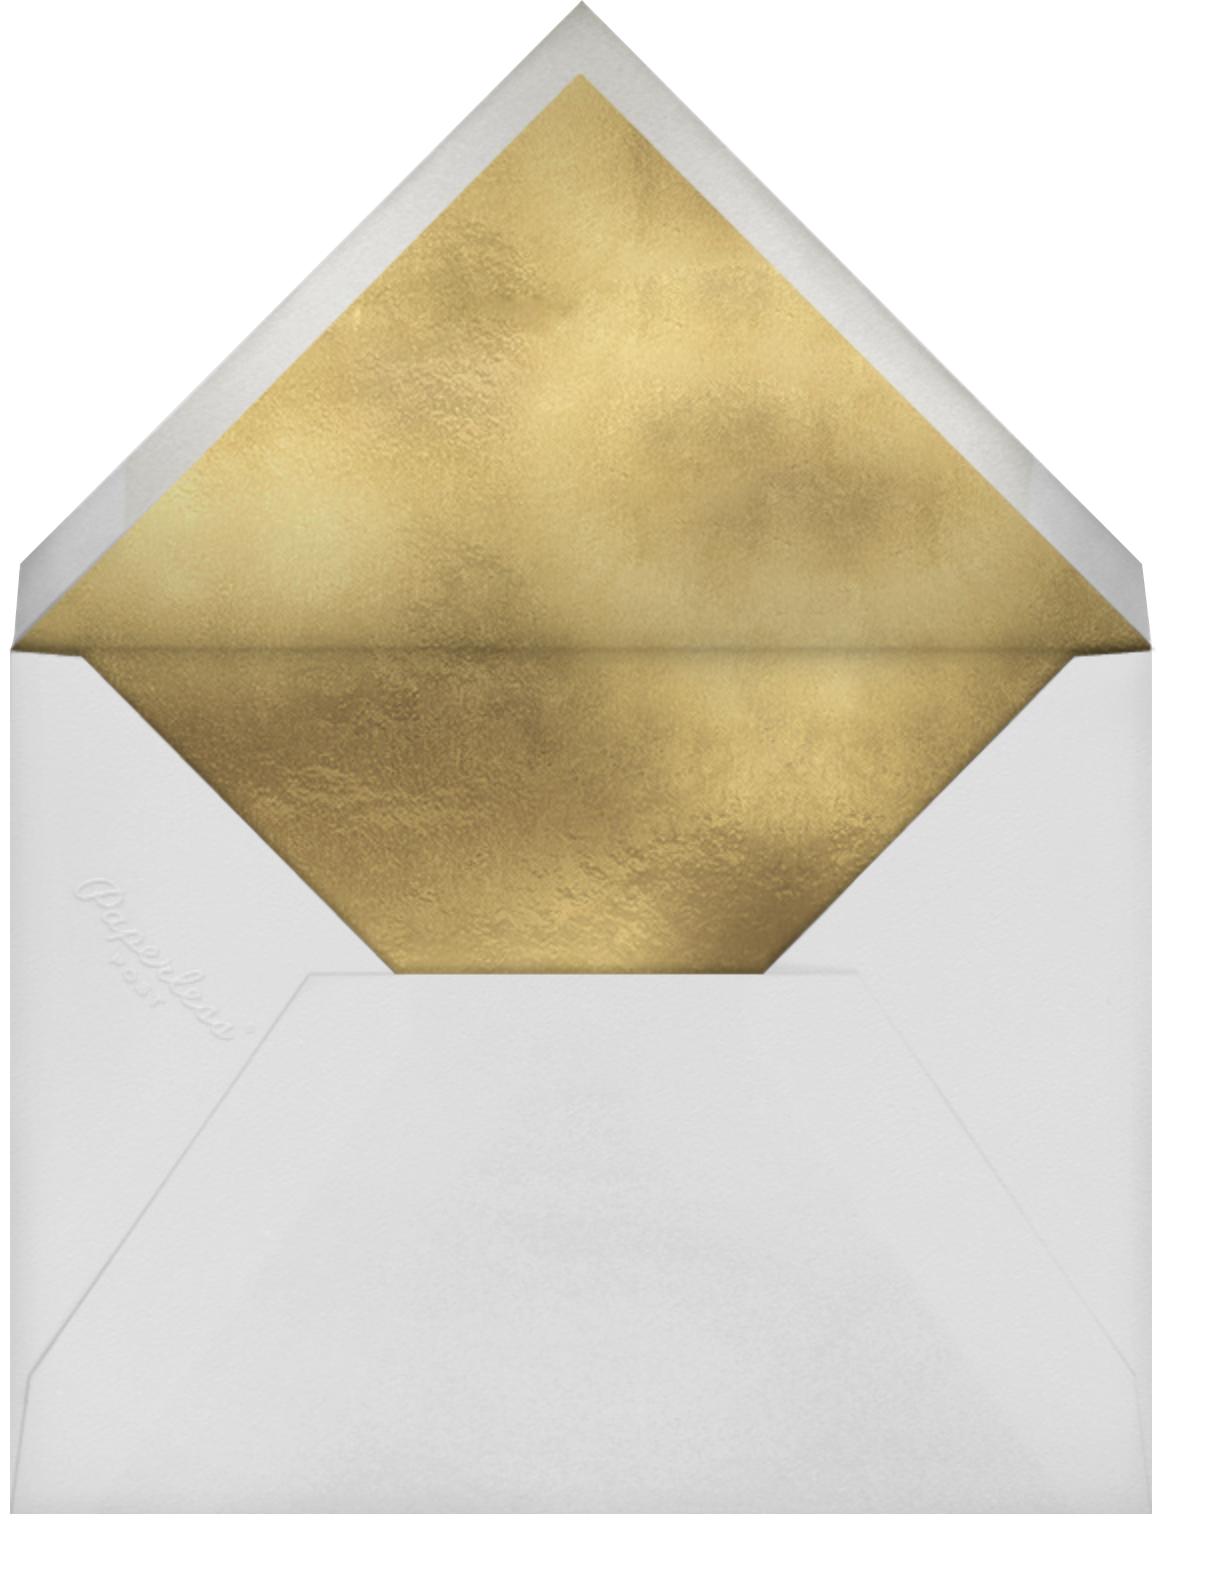 Posey - Black - Rifle Paper Co. - Envelope